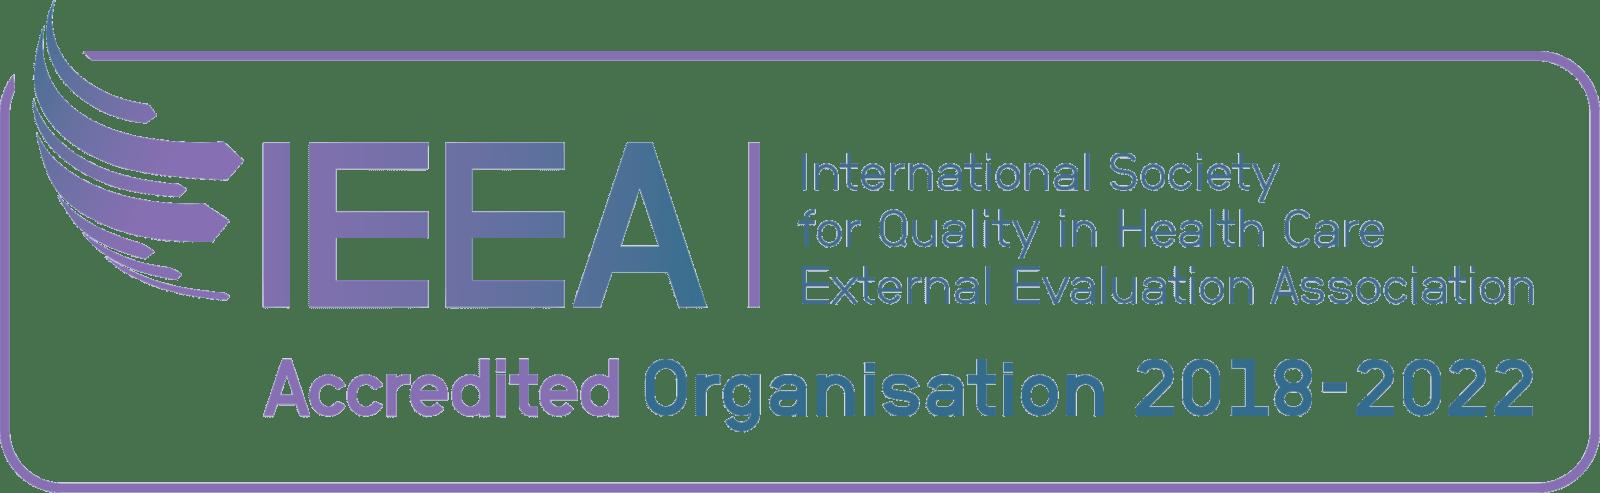 IEEA_Final_Logo_Award_Organisation_2018-2022